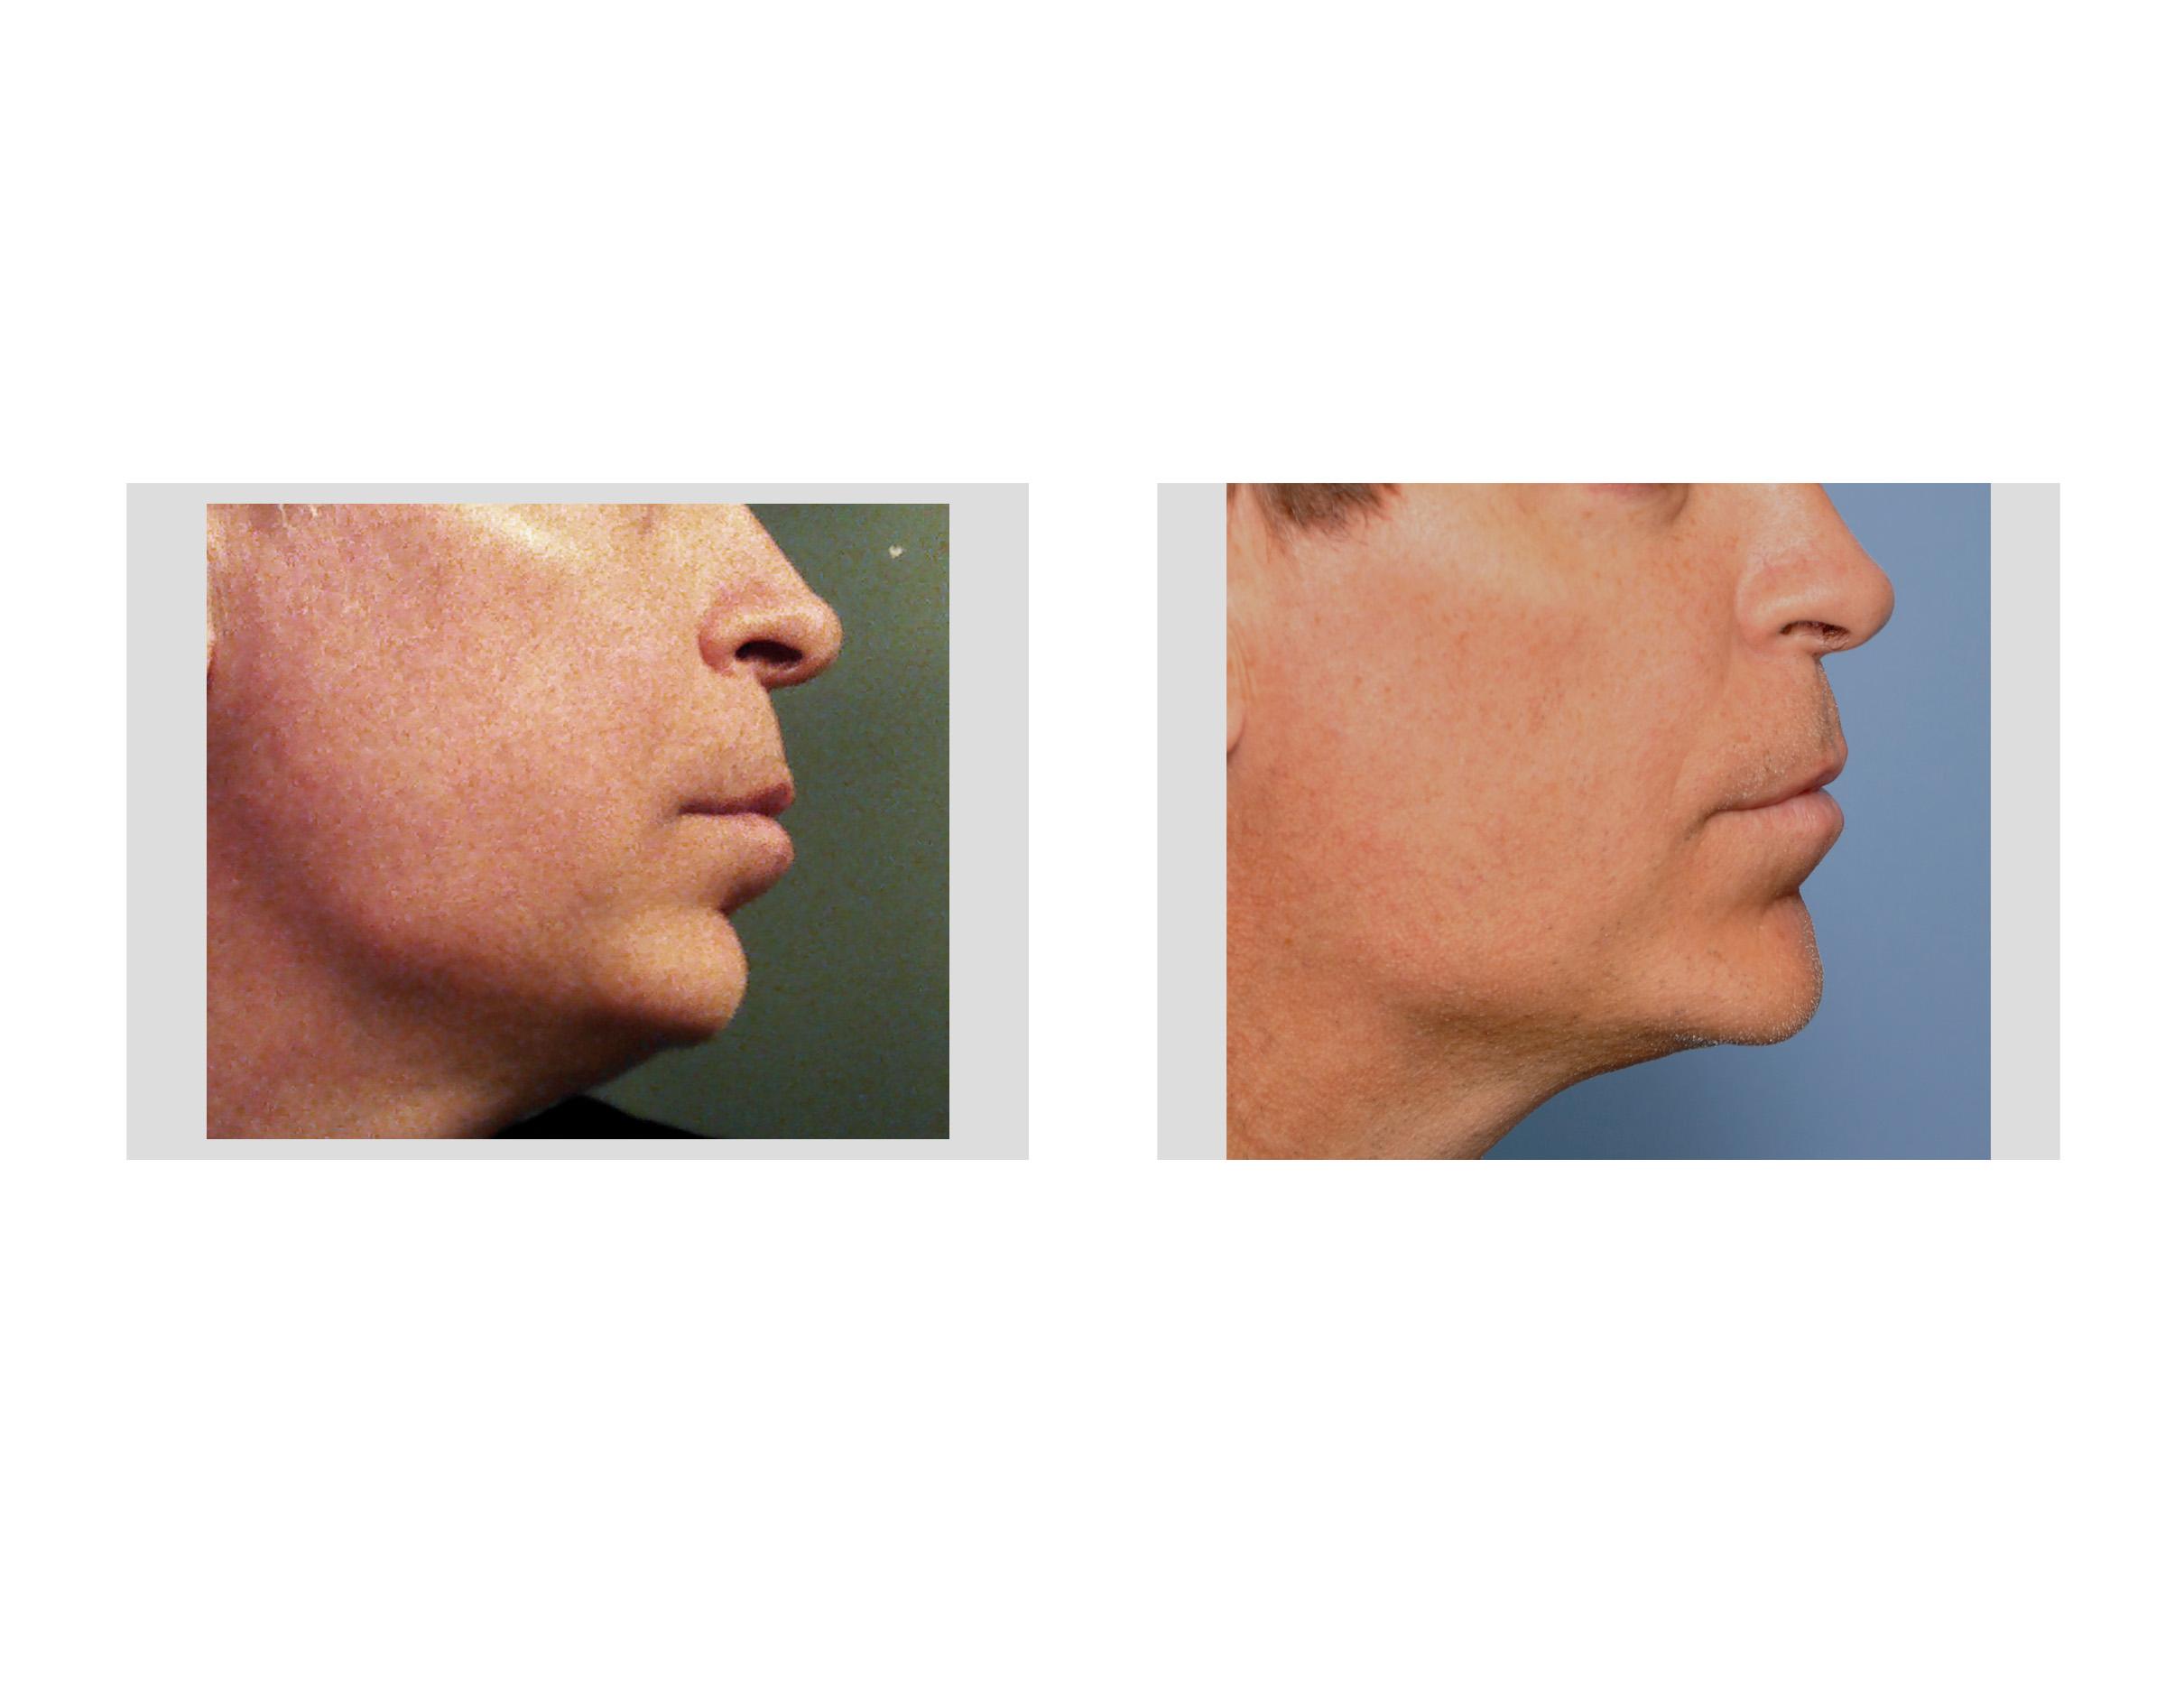 Alloplastic implant to facial bone